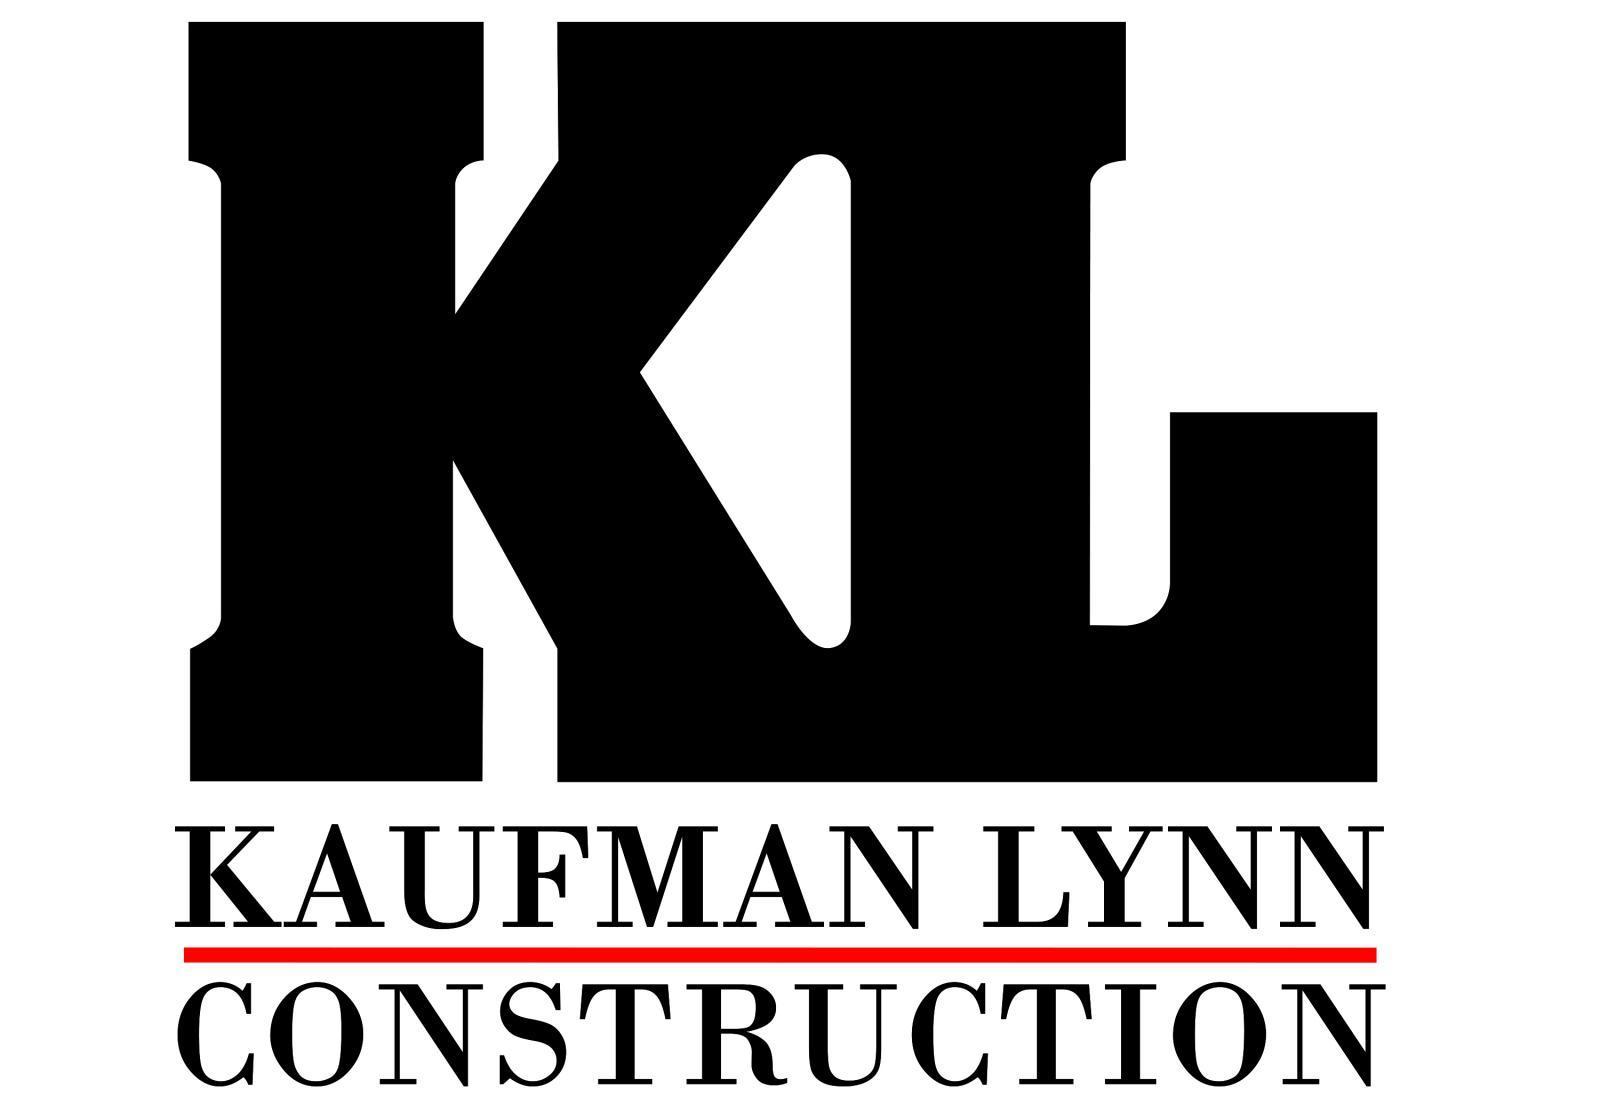 Kaufman Lynn Construction